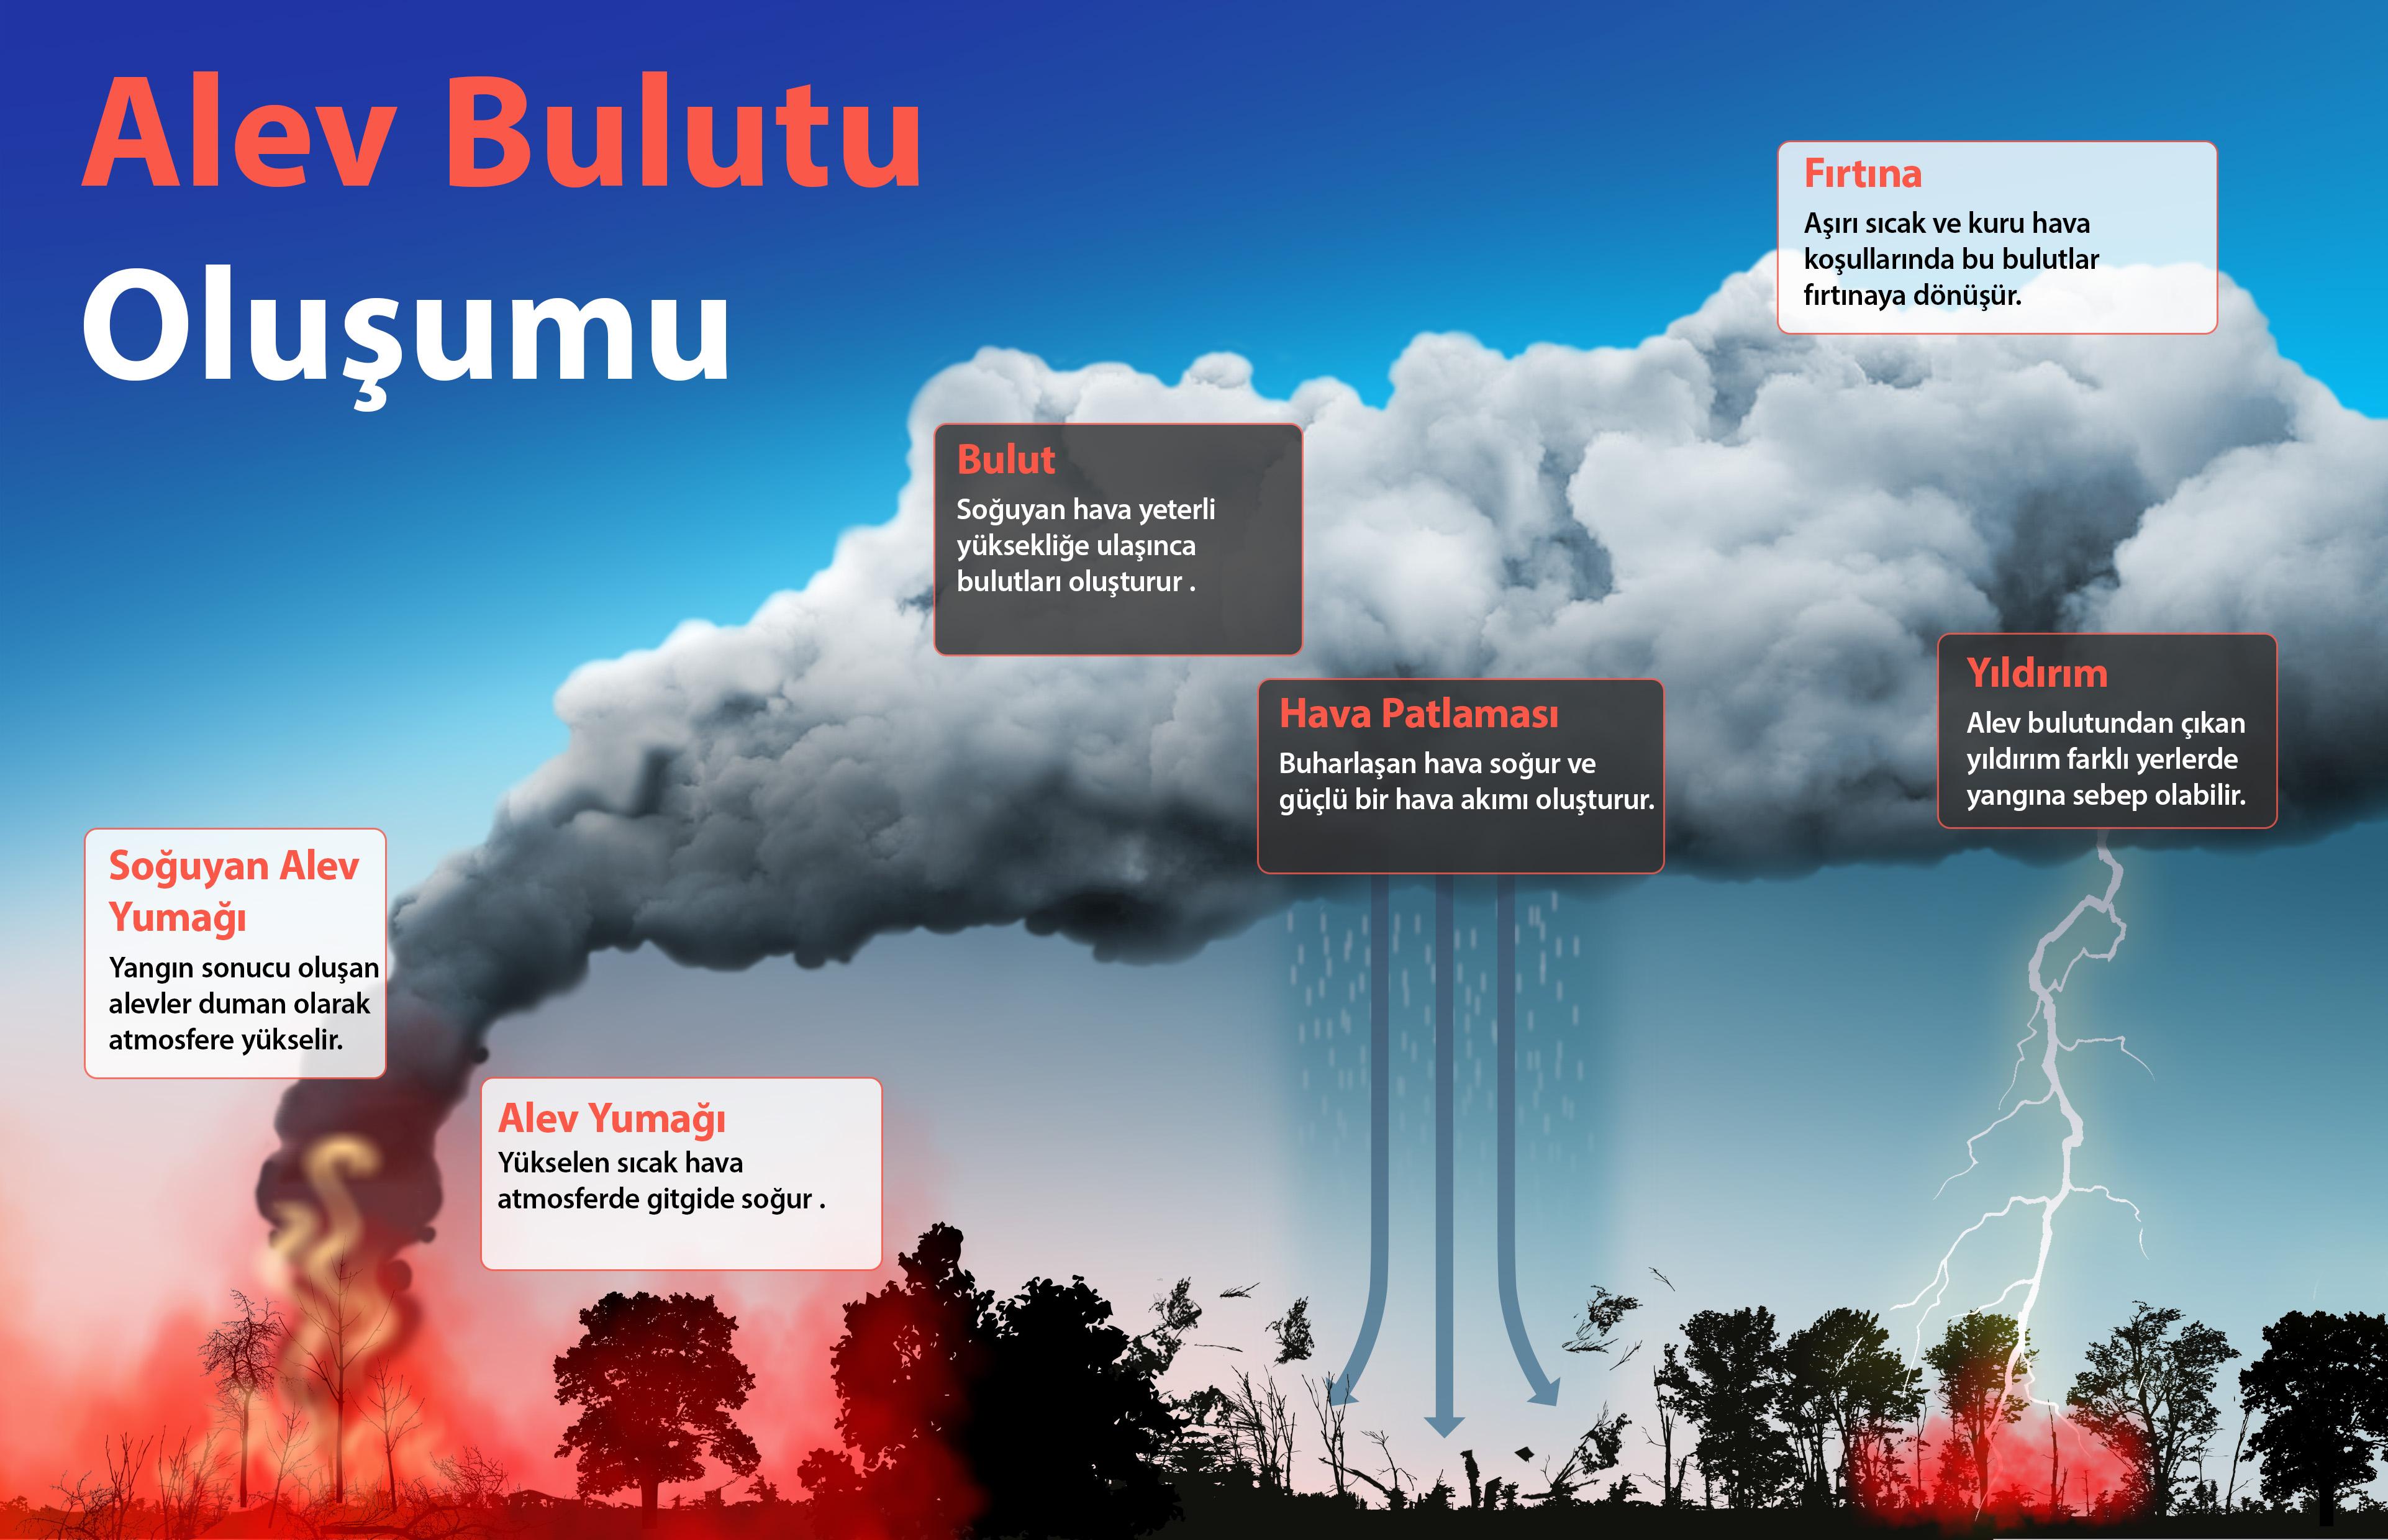 data-cke-saved-src=http://bilimgenc.tubitak.gov.tr/sites/default/files/alev_bulutu_olusumu.jpg